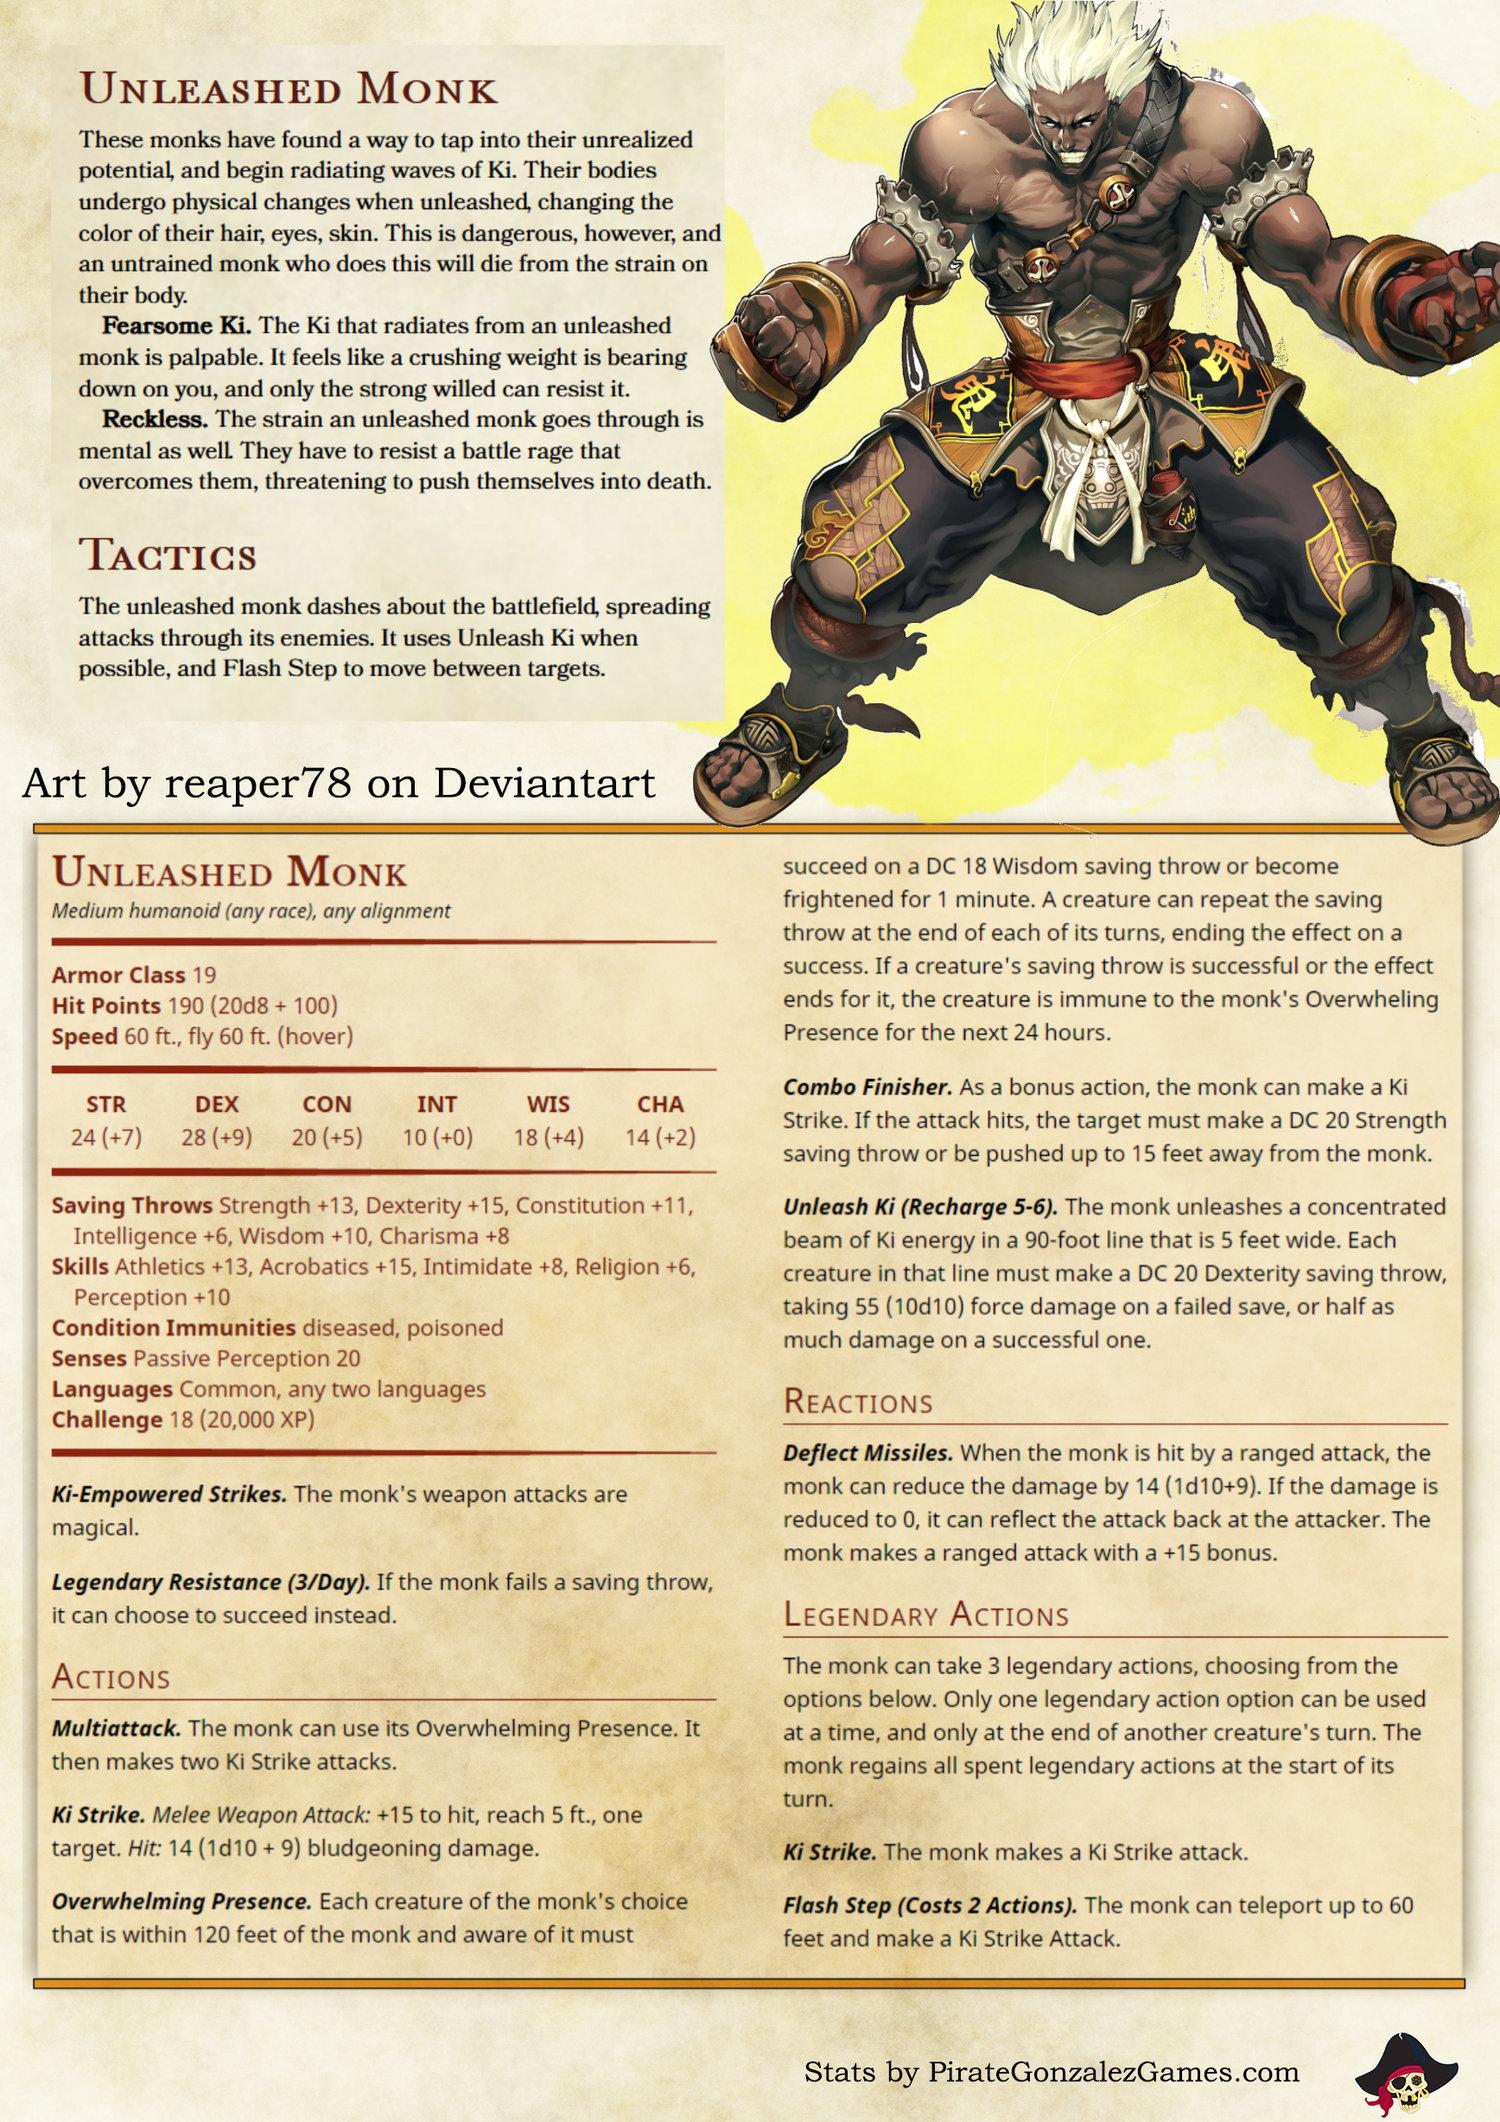 Fight a Super Saiyan! The Unleashed Monk NPC — Pirate Gonzalez Games